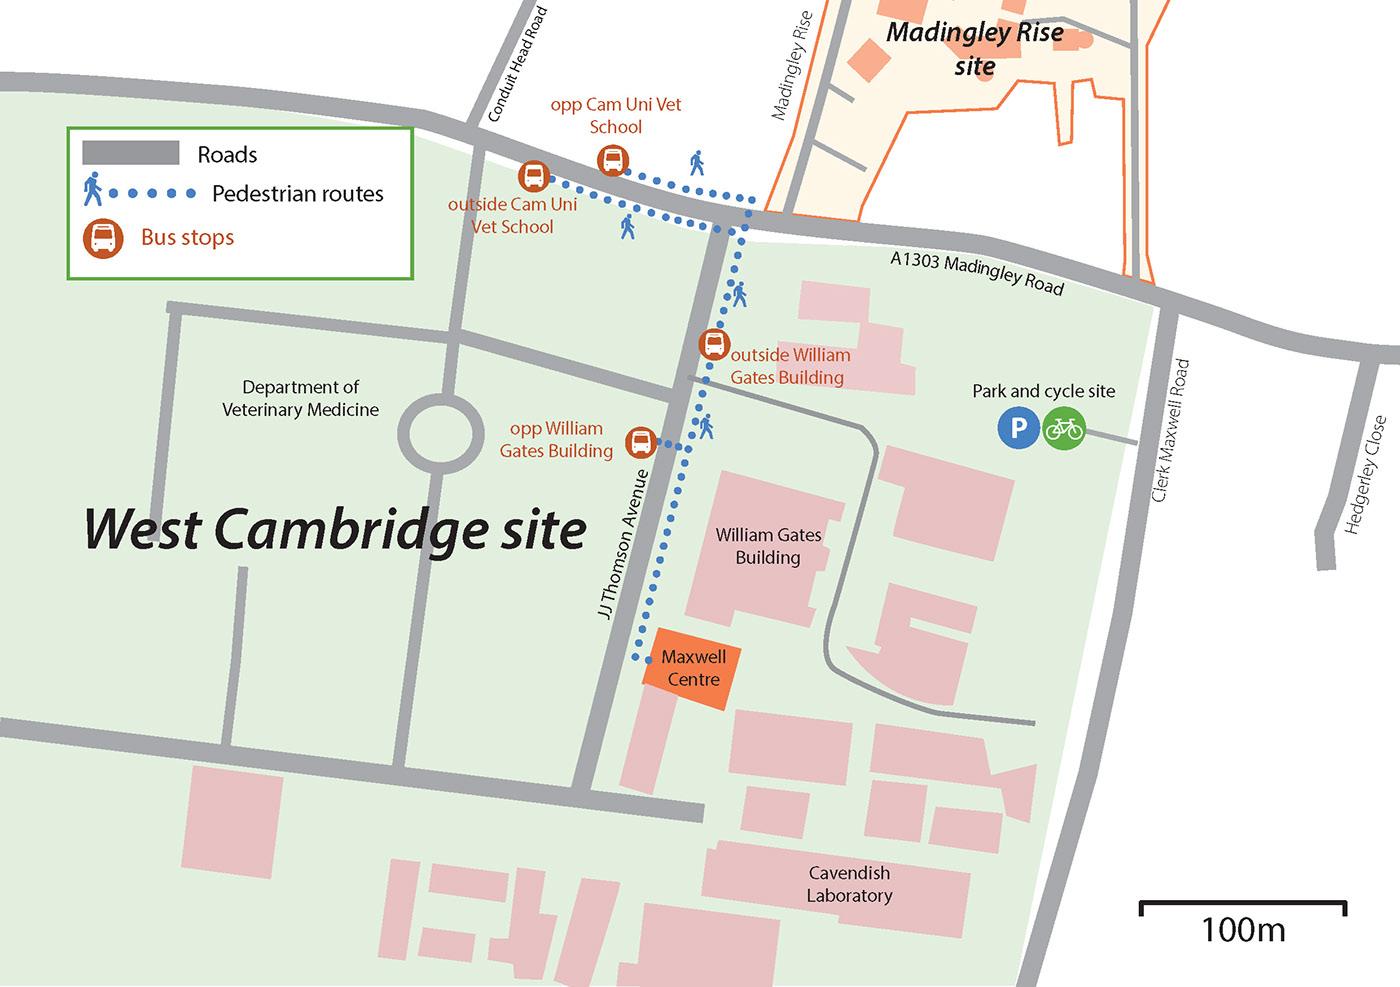 maps,cambridge,University of Cambridge,Transport,Cycling,streetmap